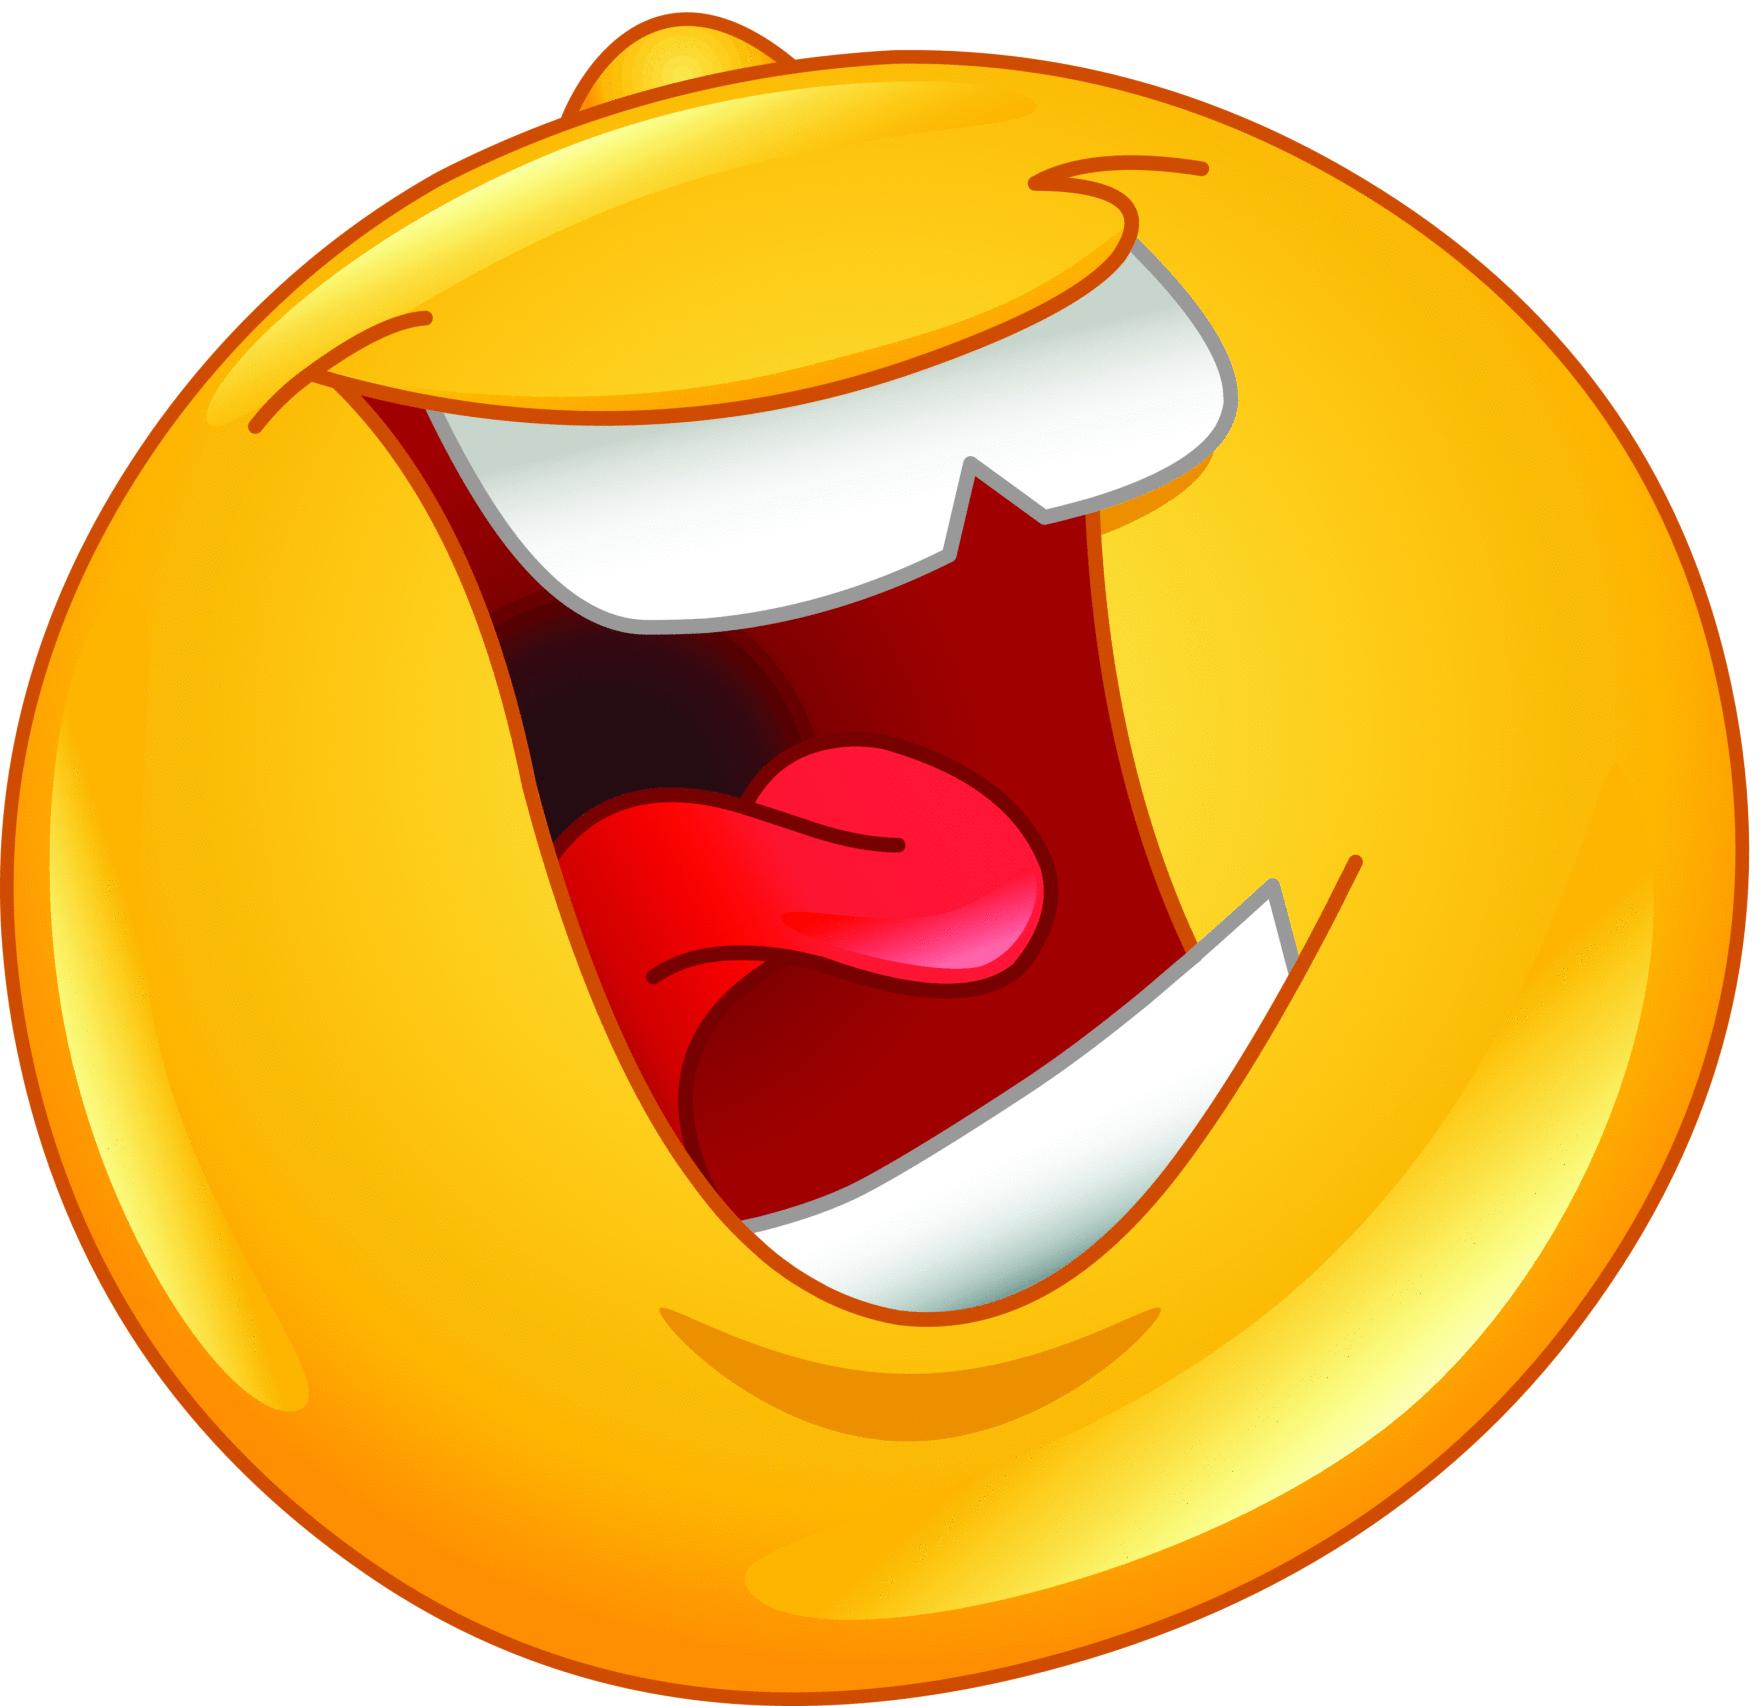 Laughing Clip Art Clipart Best-Laughing Clip Art Clipart Best-9